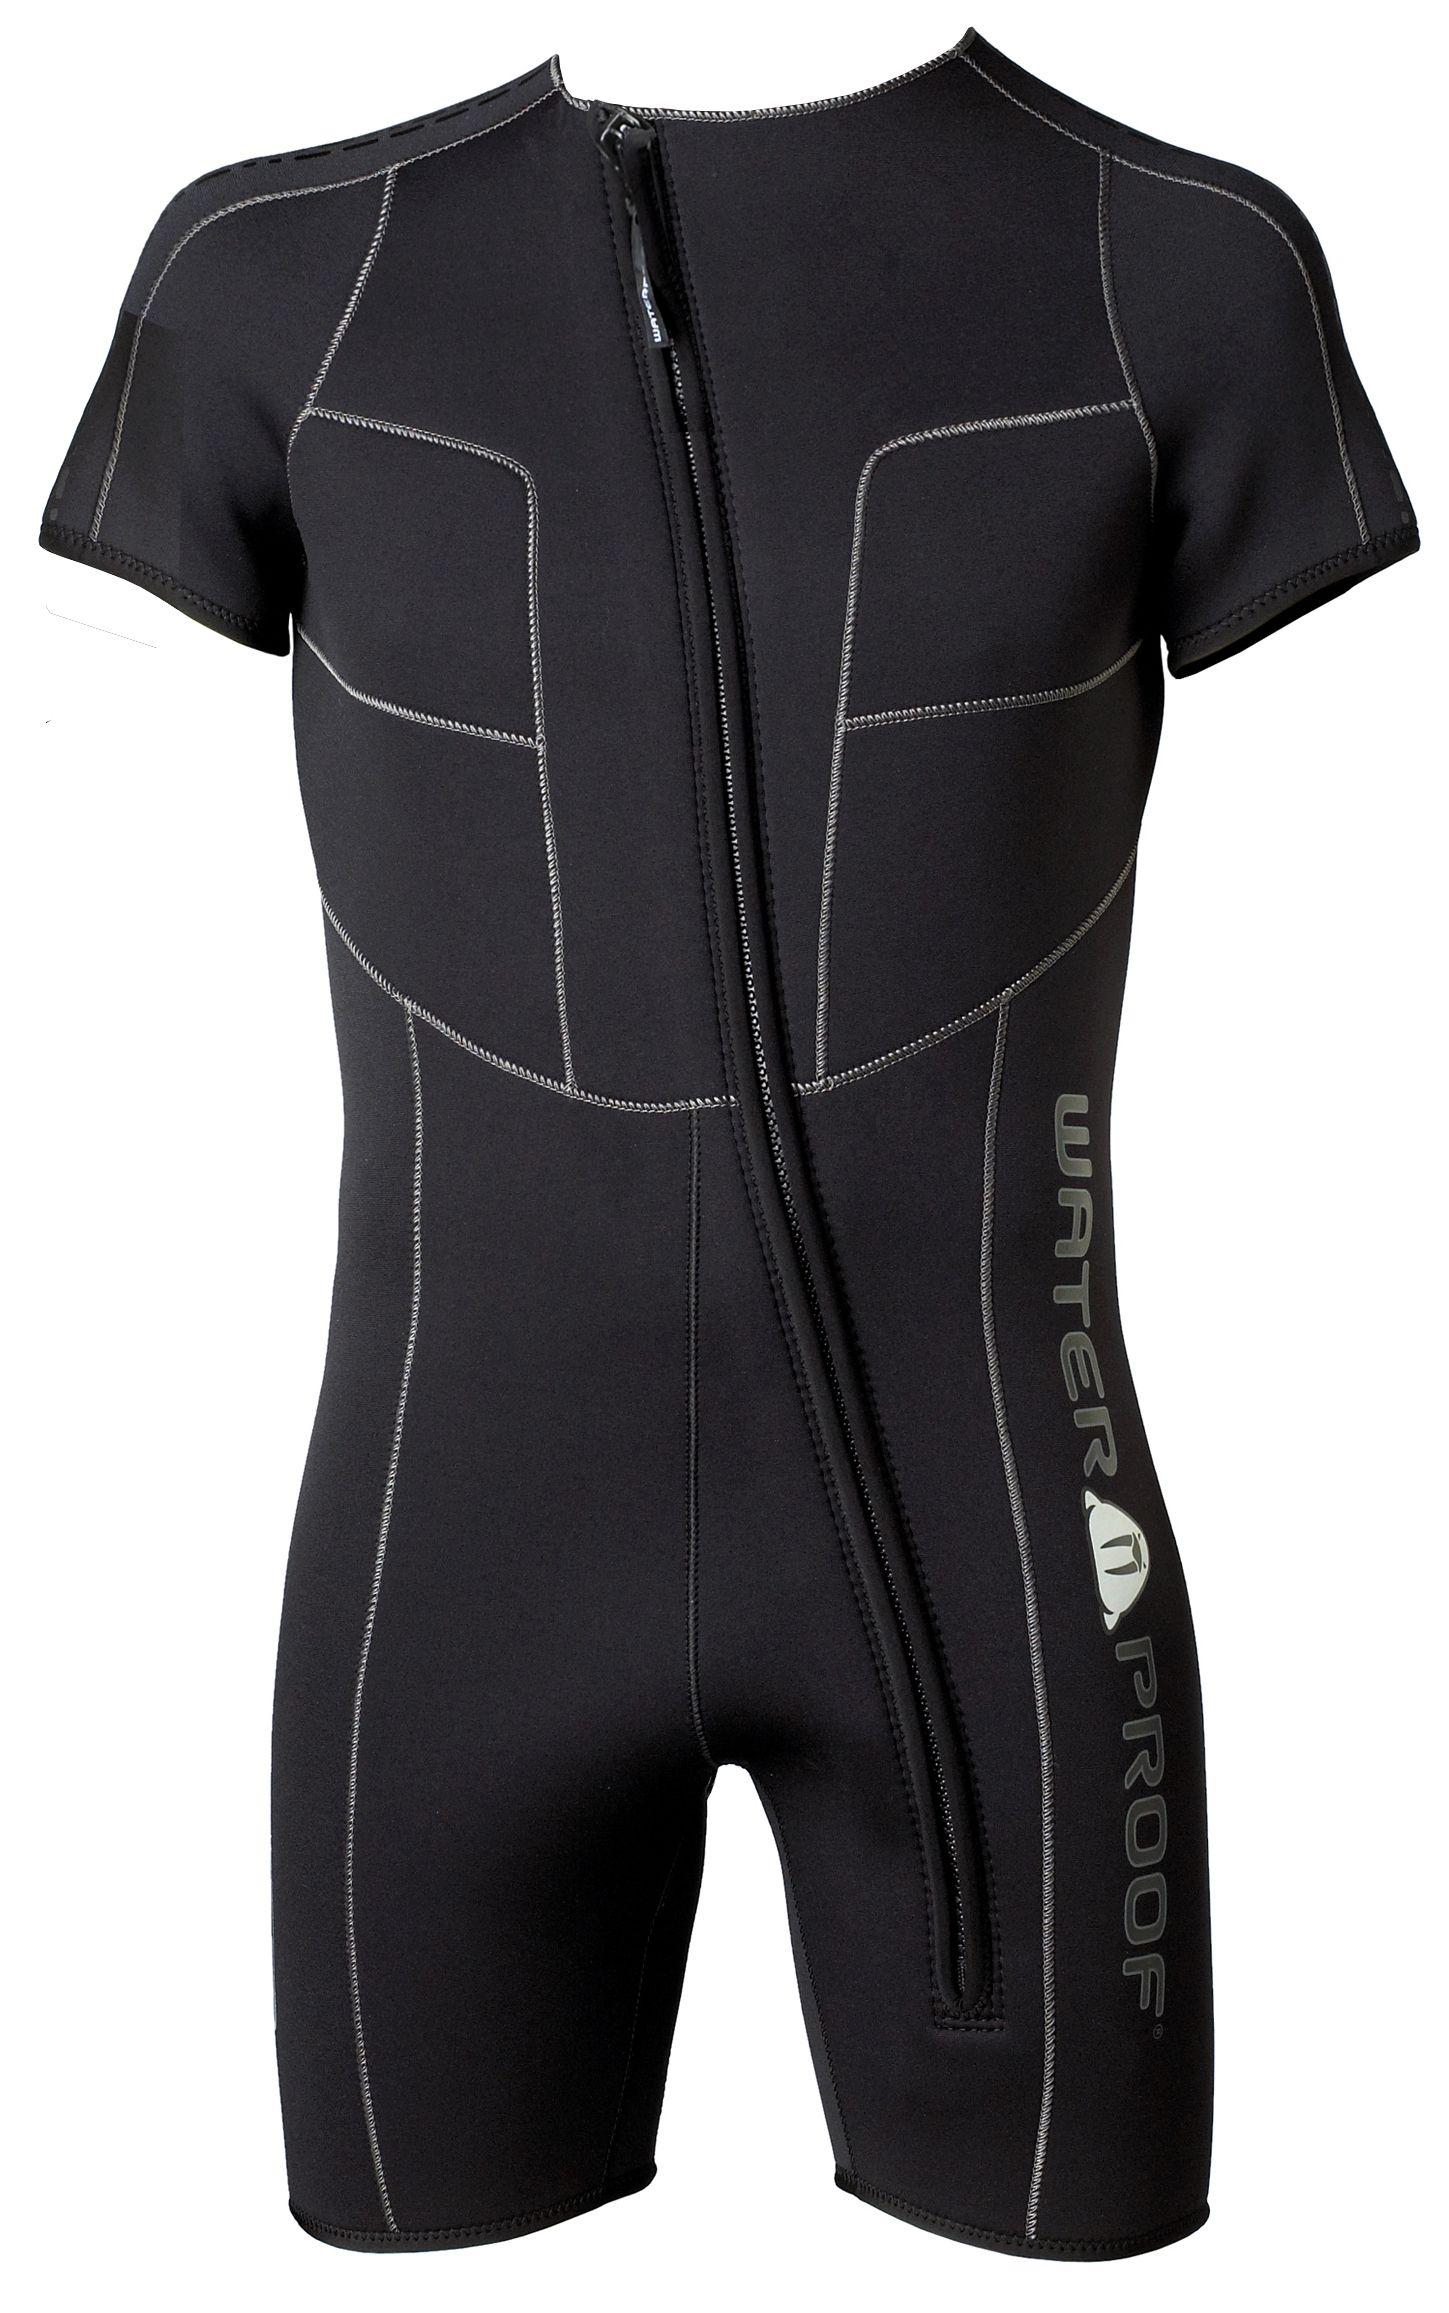 Дамски неопренов водолаен костюм W-SERIES OVERVEST Lady 5 мм - Waterproof